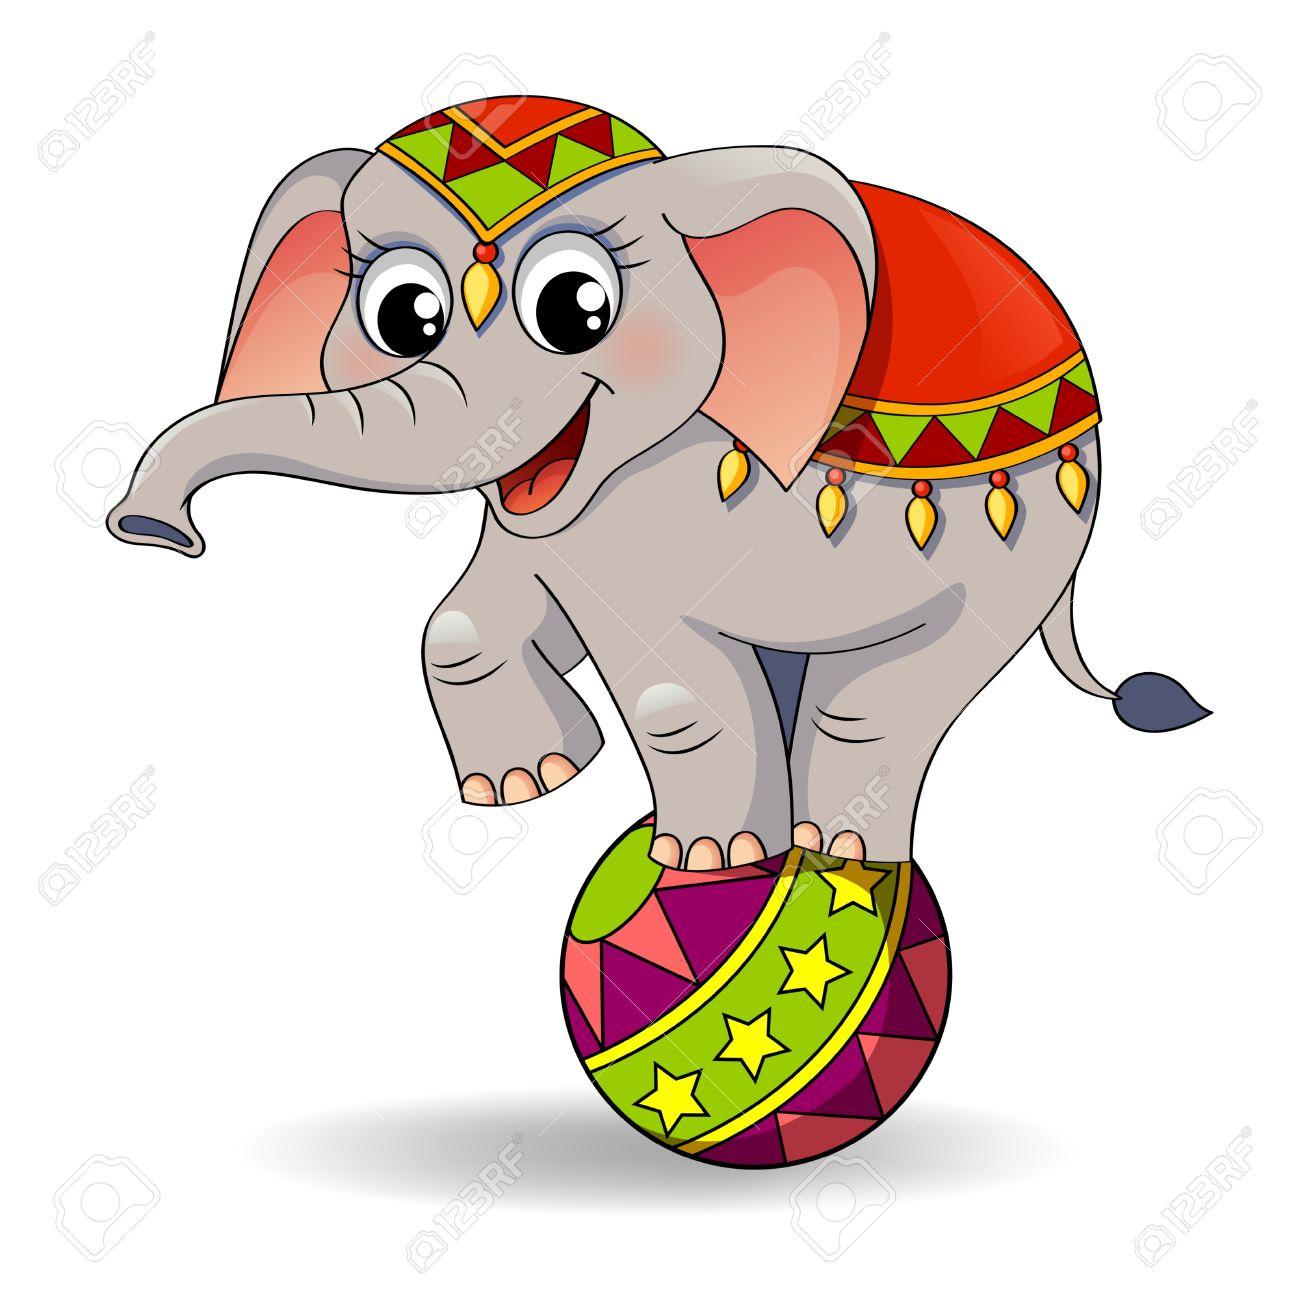 1300x1300 Funny Cartoon Circus Elephant Balancing On Ball Royalty Free